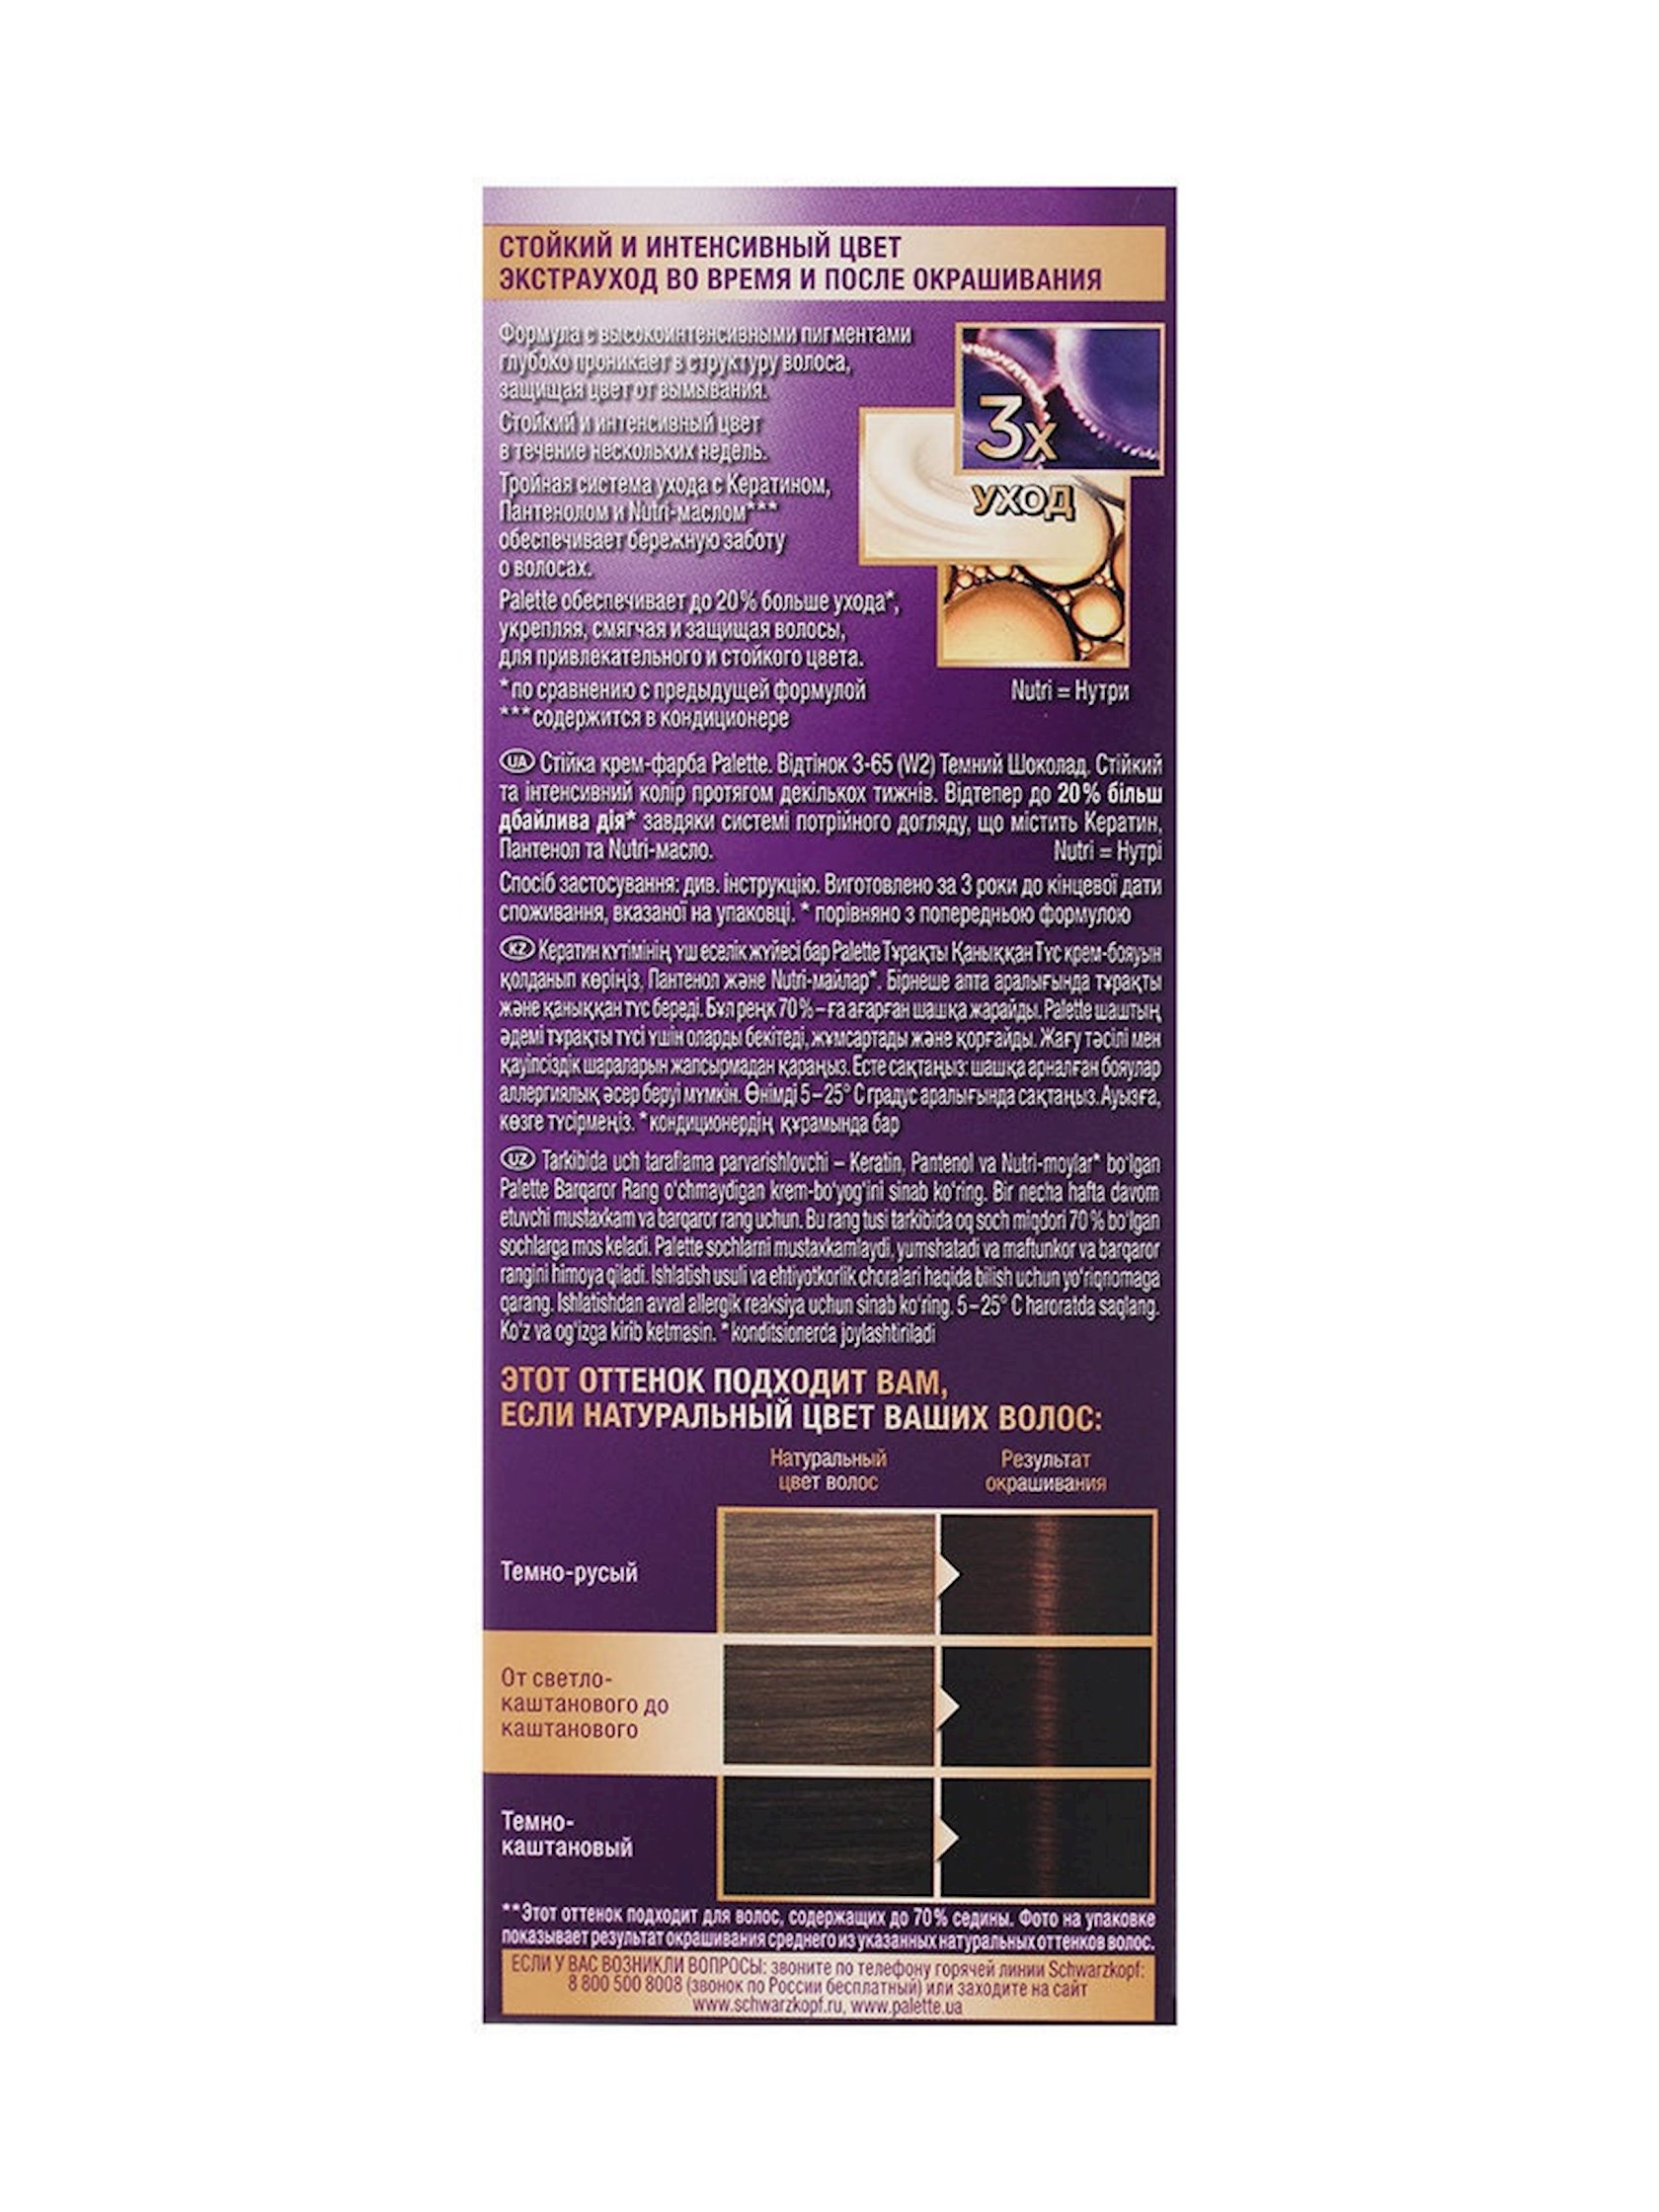 Saç üçün qalıcı krem-boya Palette W2 3-65 Tünd şokolad